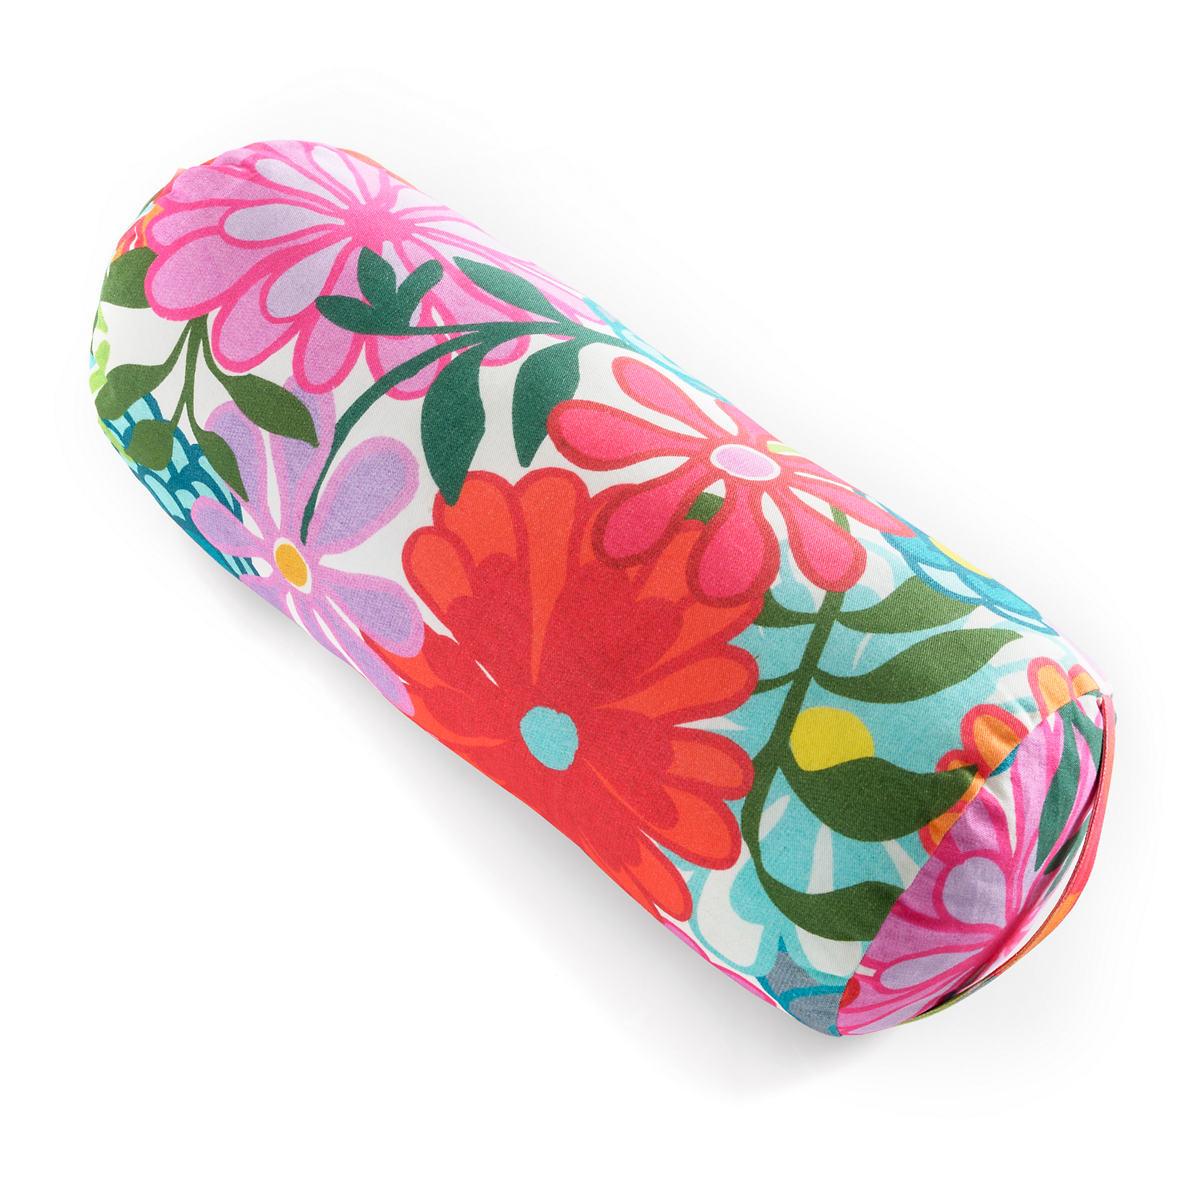 Salutation Floral Bolster Pillow